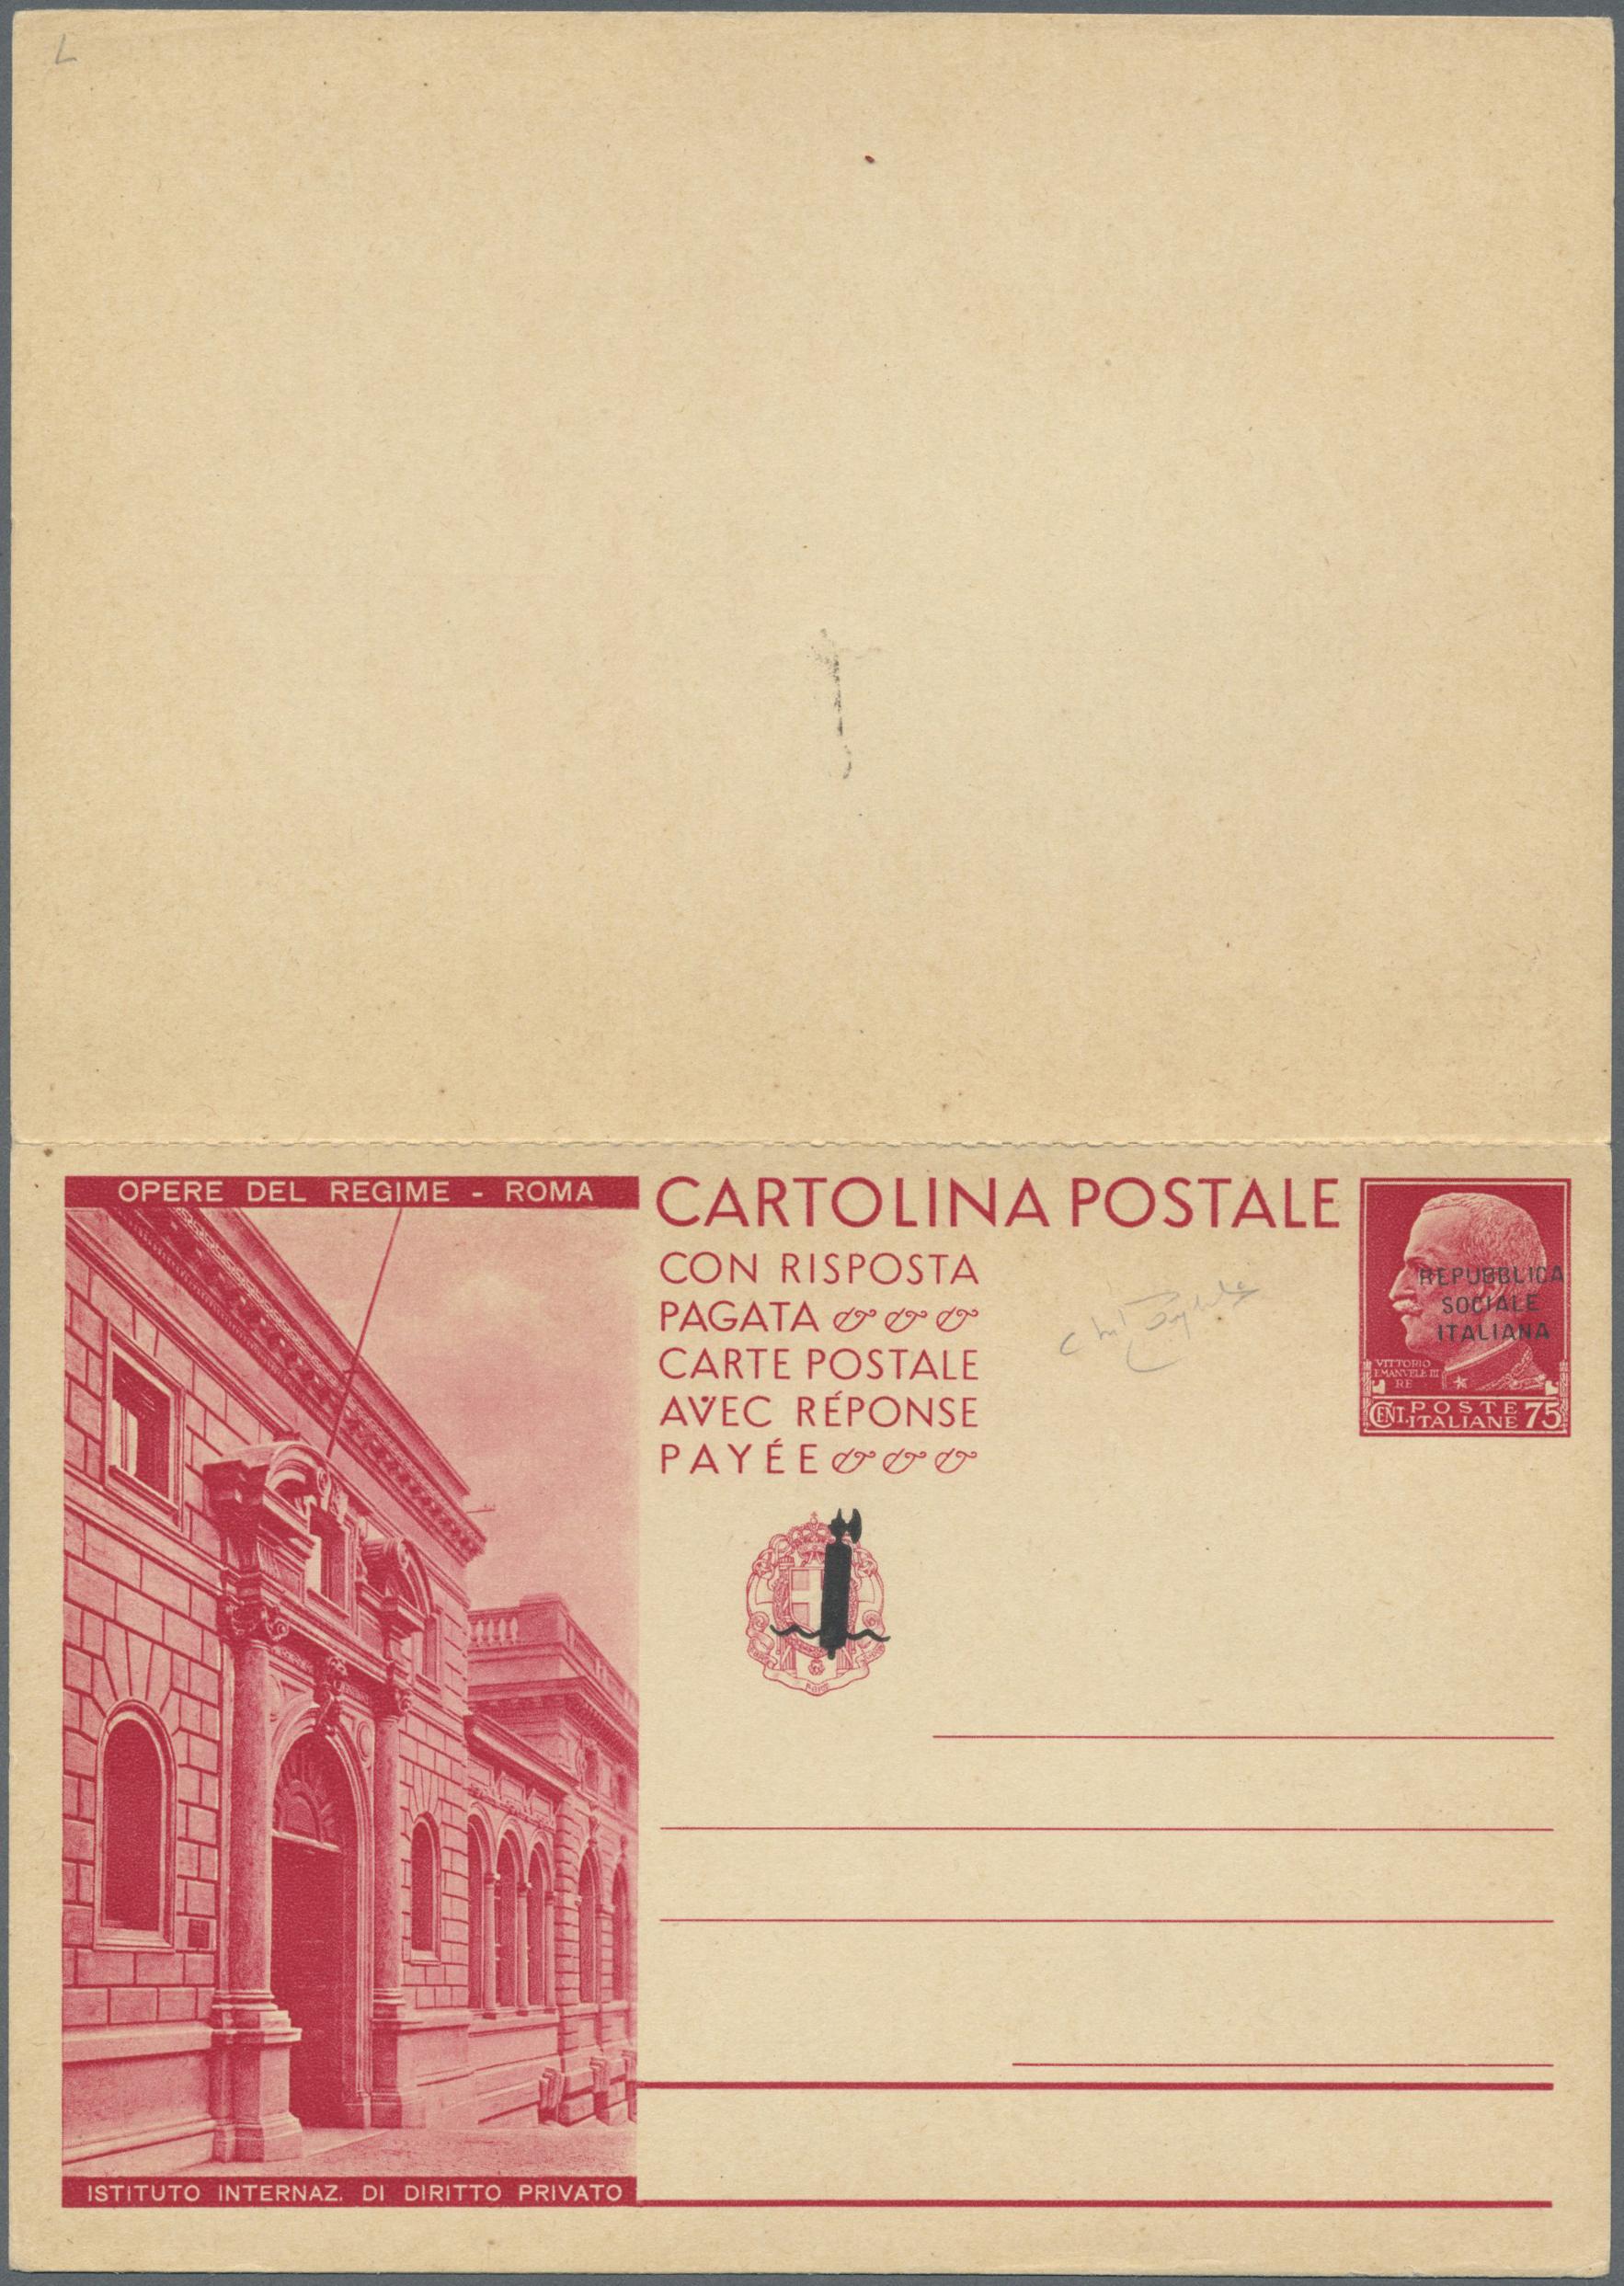 Lot 17200 - Italien - Ganzsachen  -  Auktionshaus Christoph Gärtner GmbH & Co. KG Single lots Philately Overseas & Europe. Auction #39 Day 4